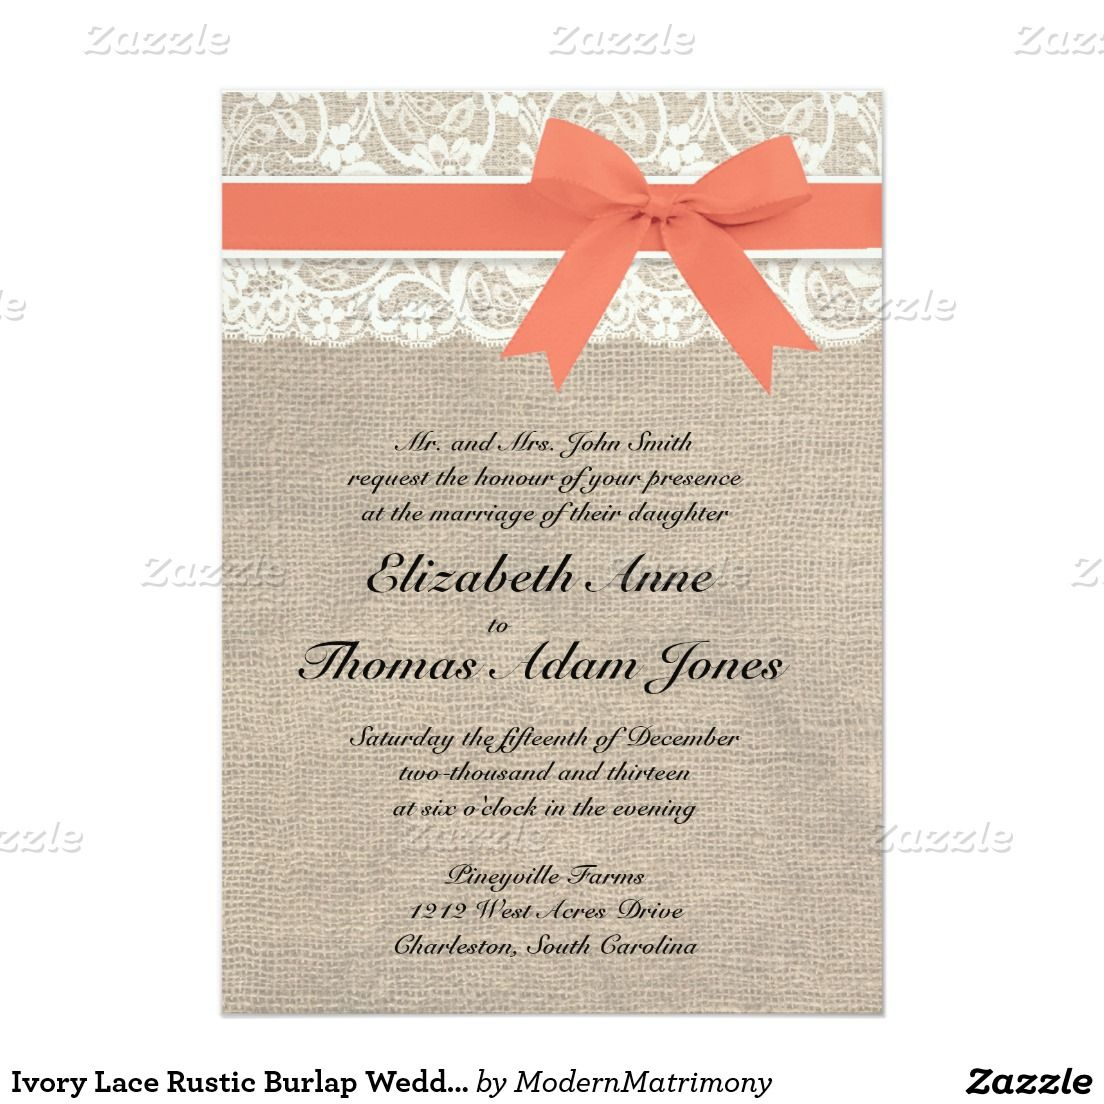 Ivory Lace Rustic Burlap Wedding Invitation- Coral 5x7 Paper ...